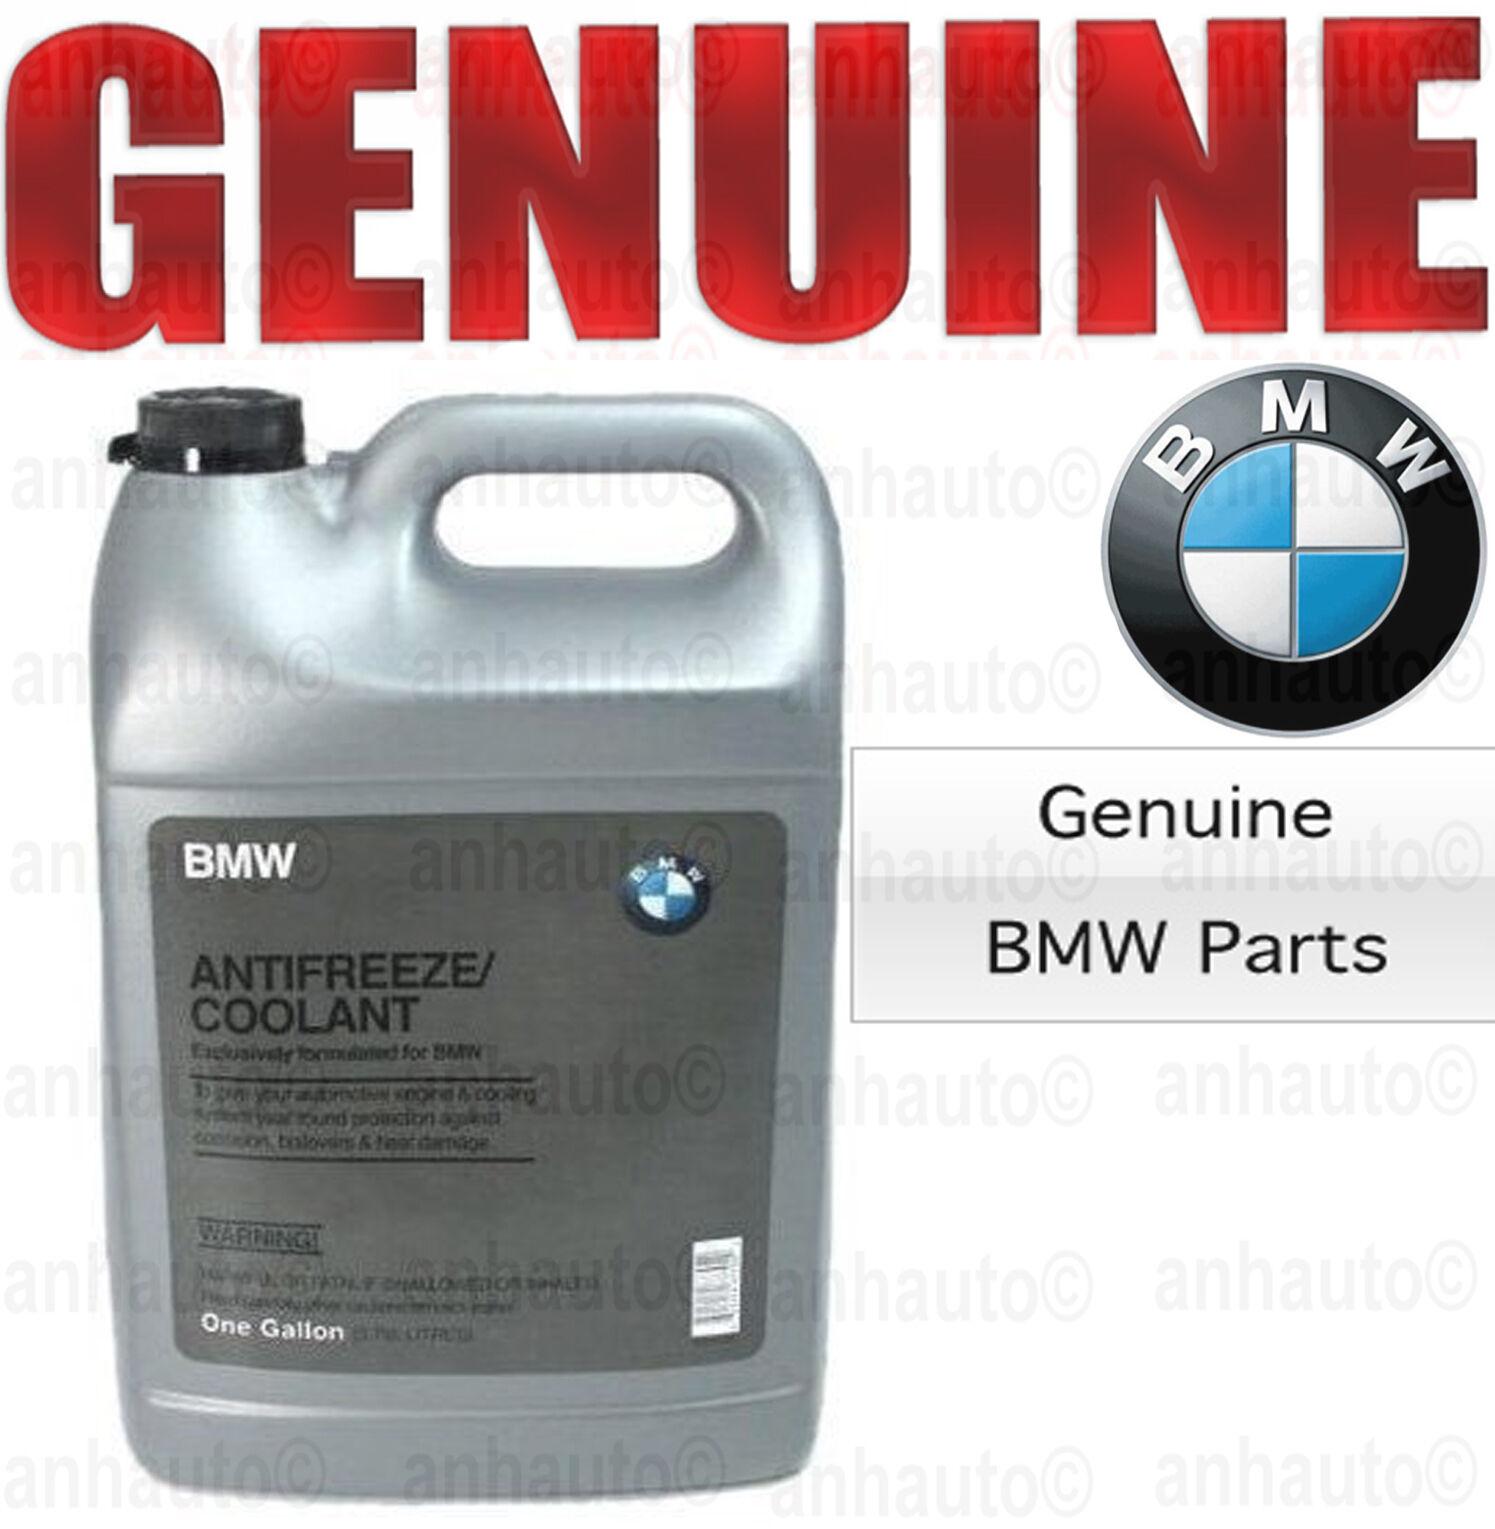 NEW 1 Galon Blue Color Antifreeze//Coolant Genuine 82 14 1 467 704 For BMW